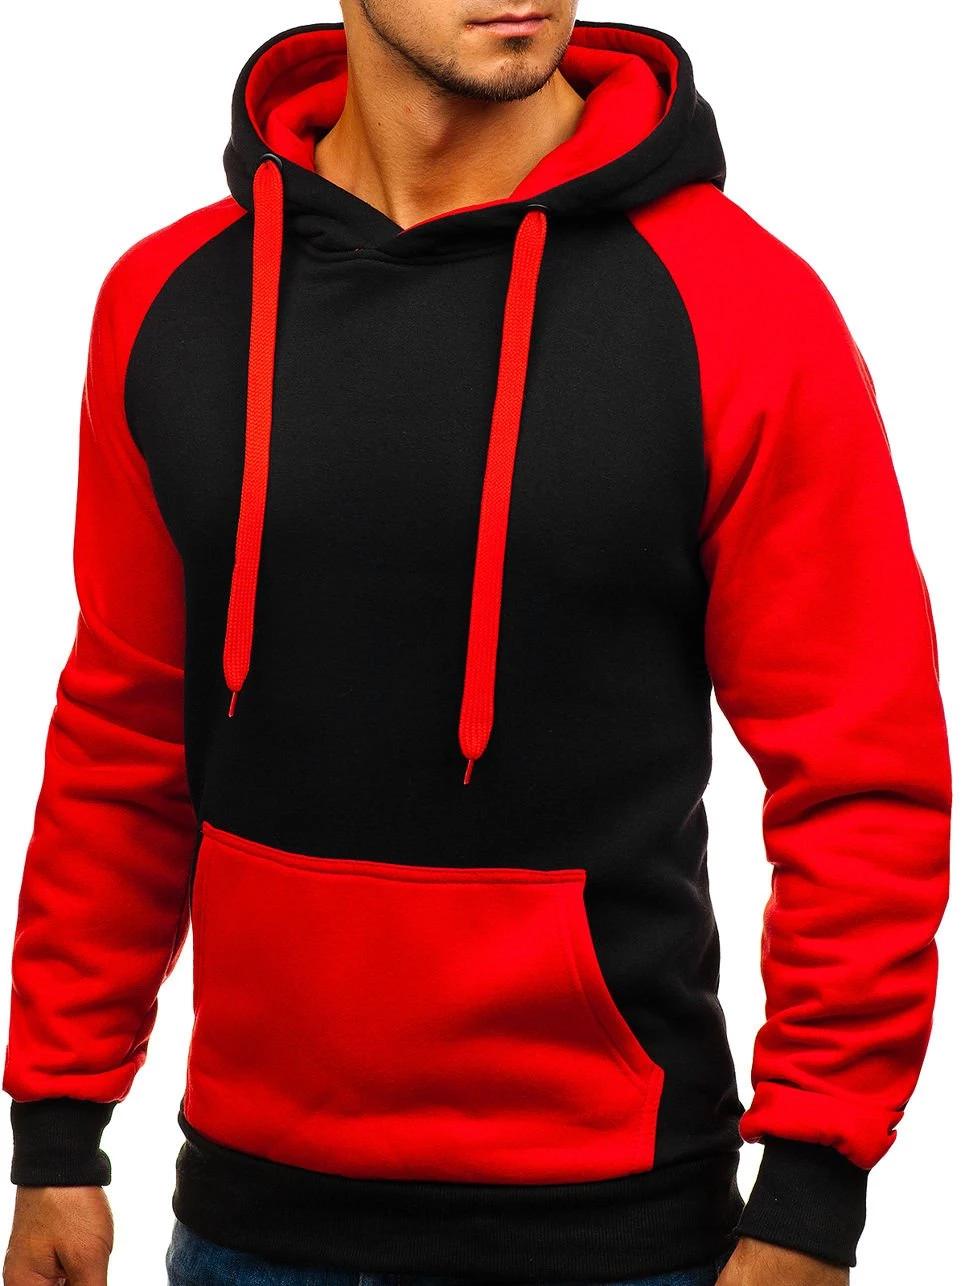 Photo of Men Hoodies Top Brand Hip Hop Solid Color Stitching Hoodies